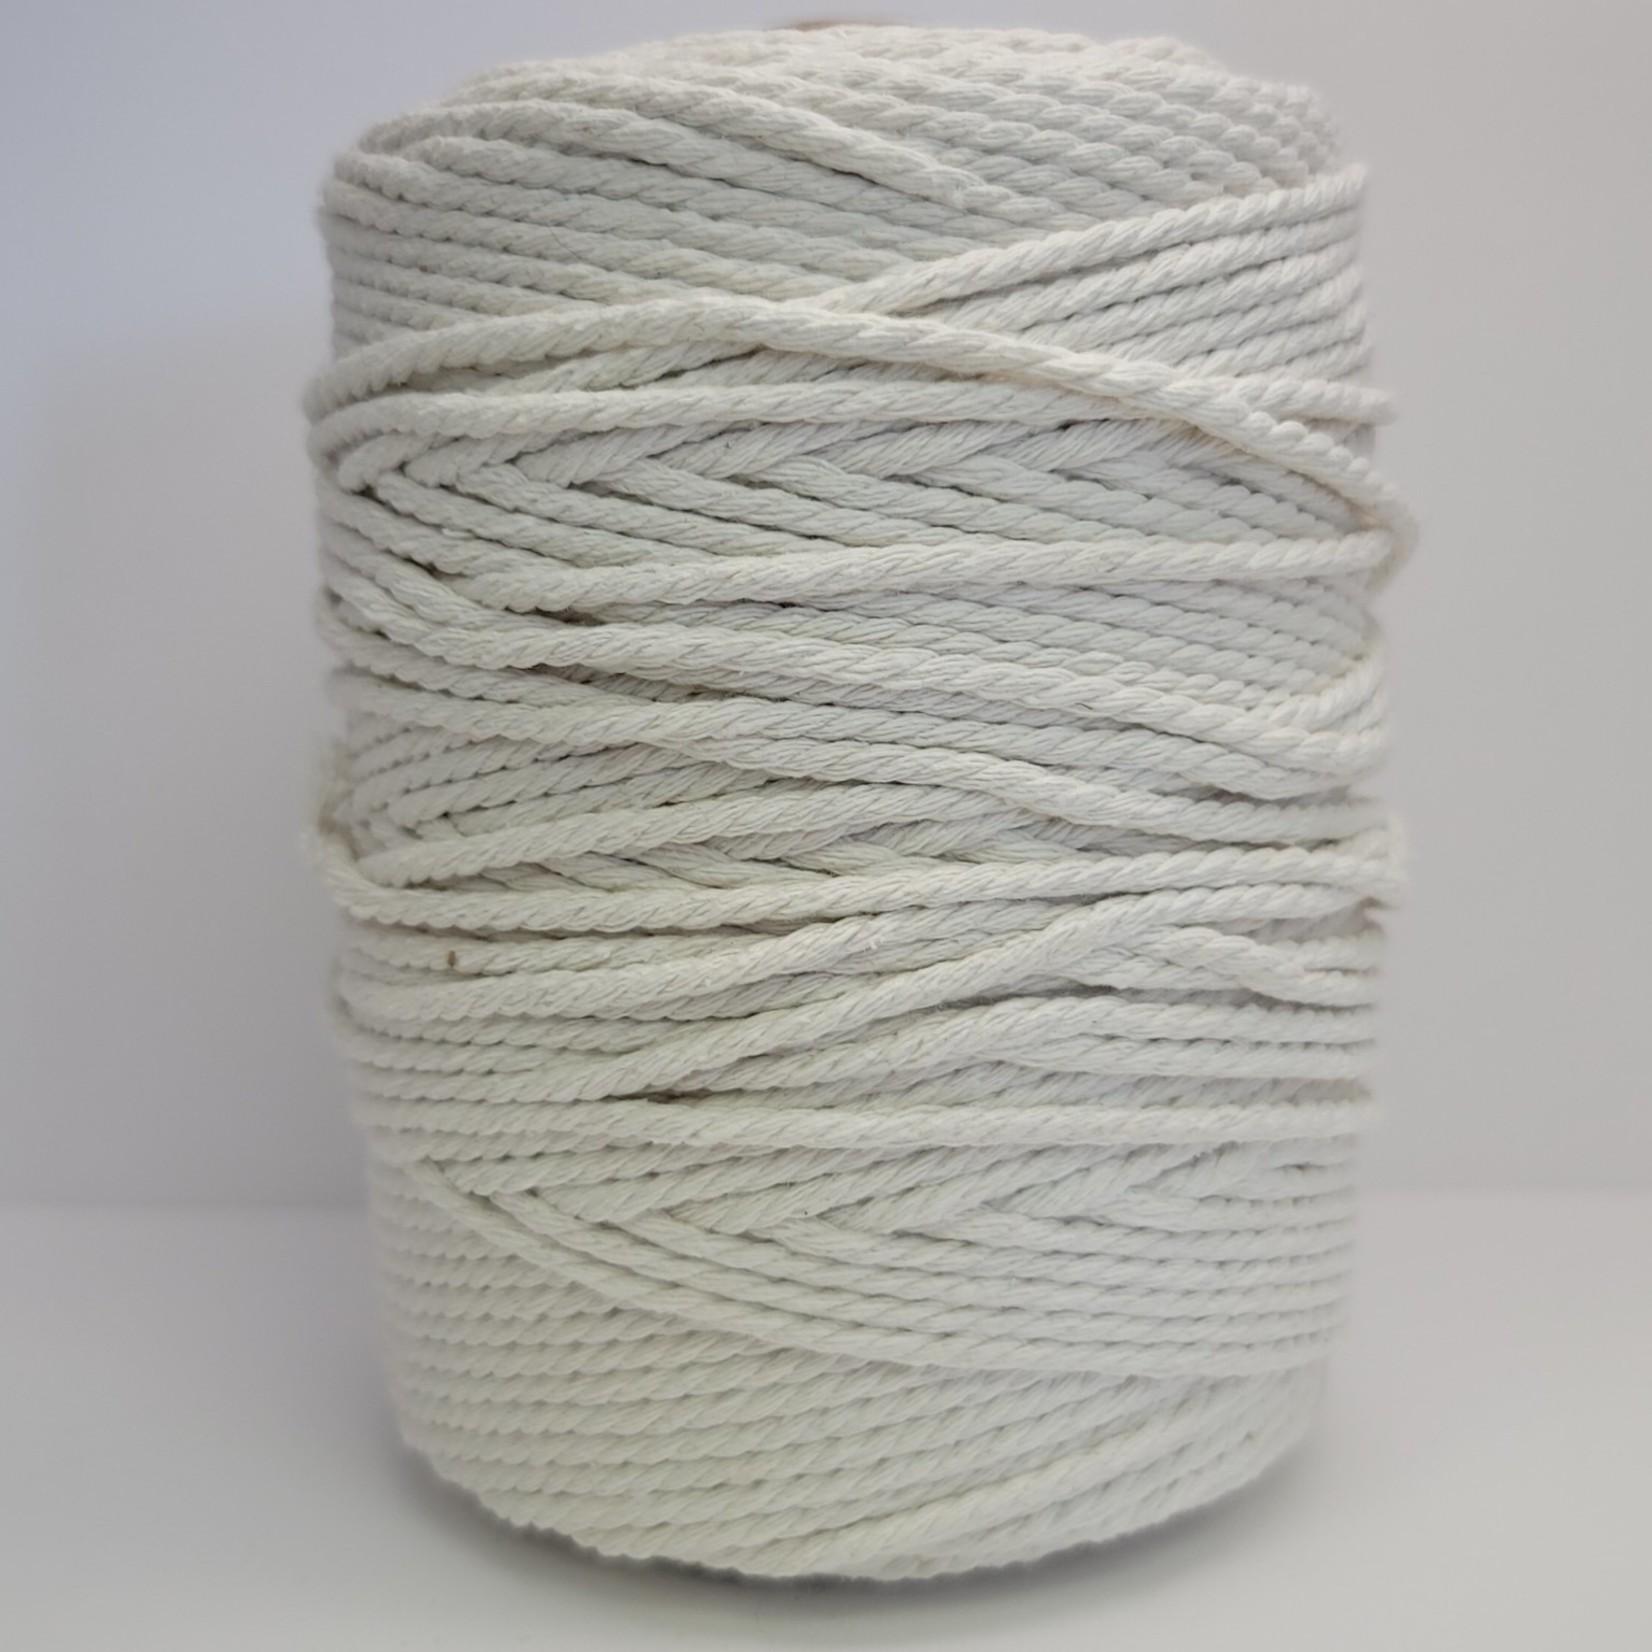 3mm Triple Strand Macrame Rope - 1kg approx 1000ft  - White Chiffon